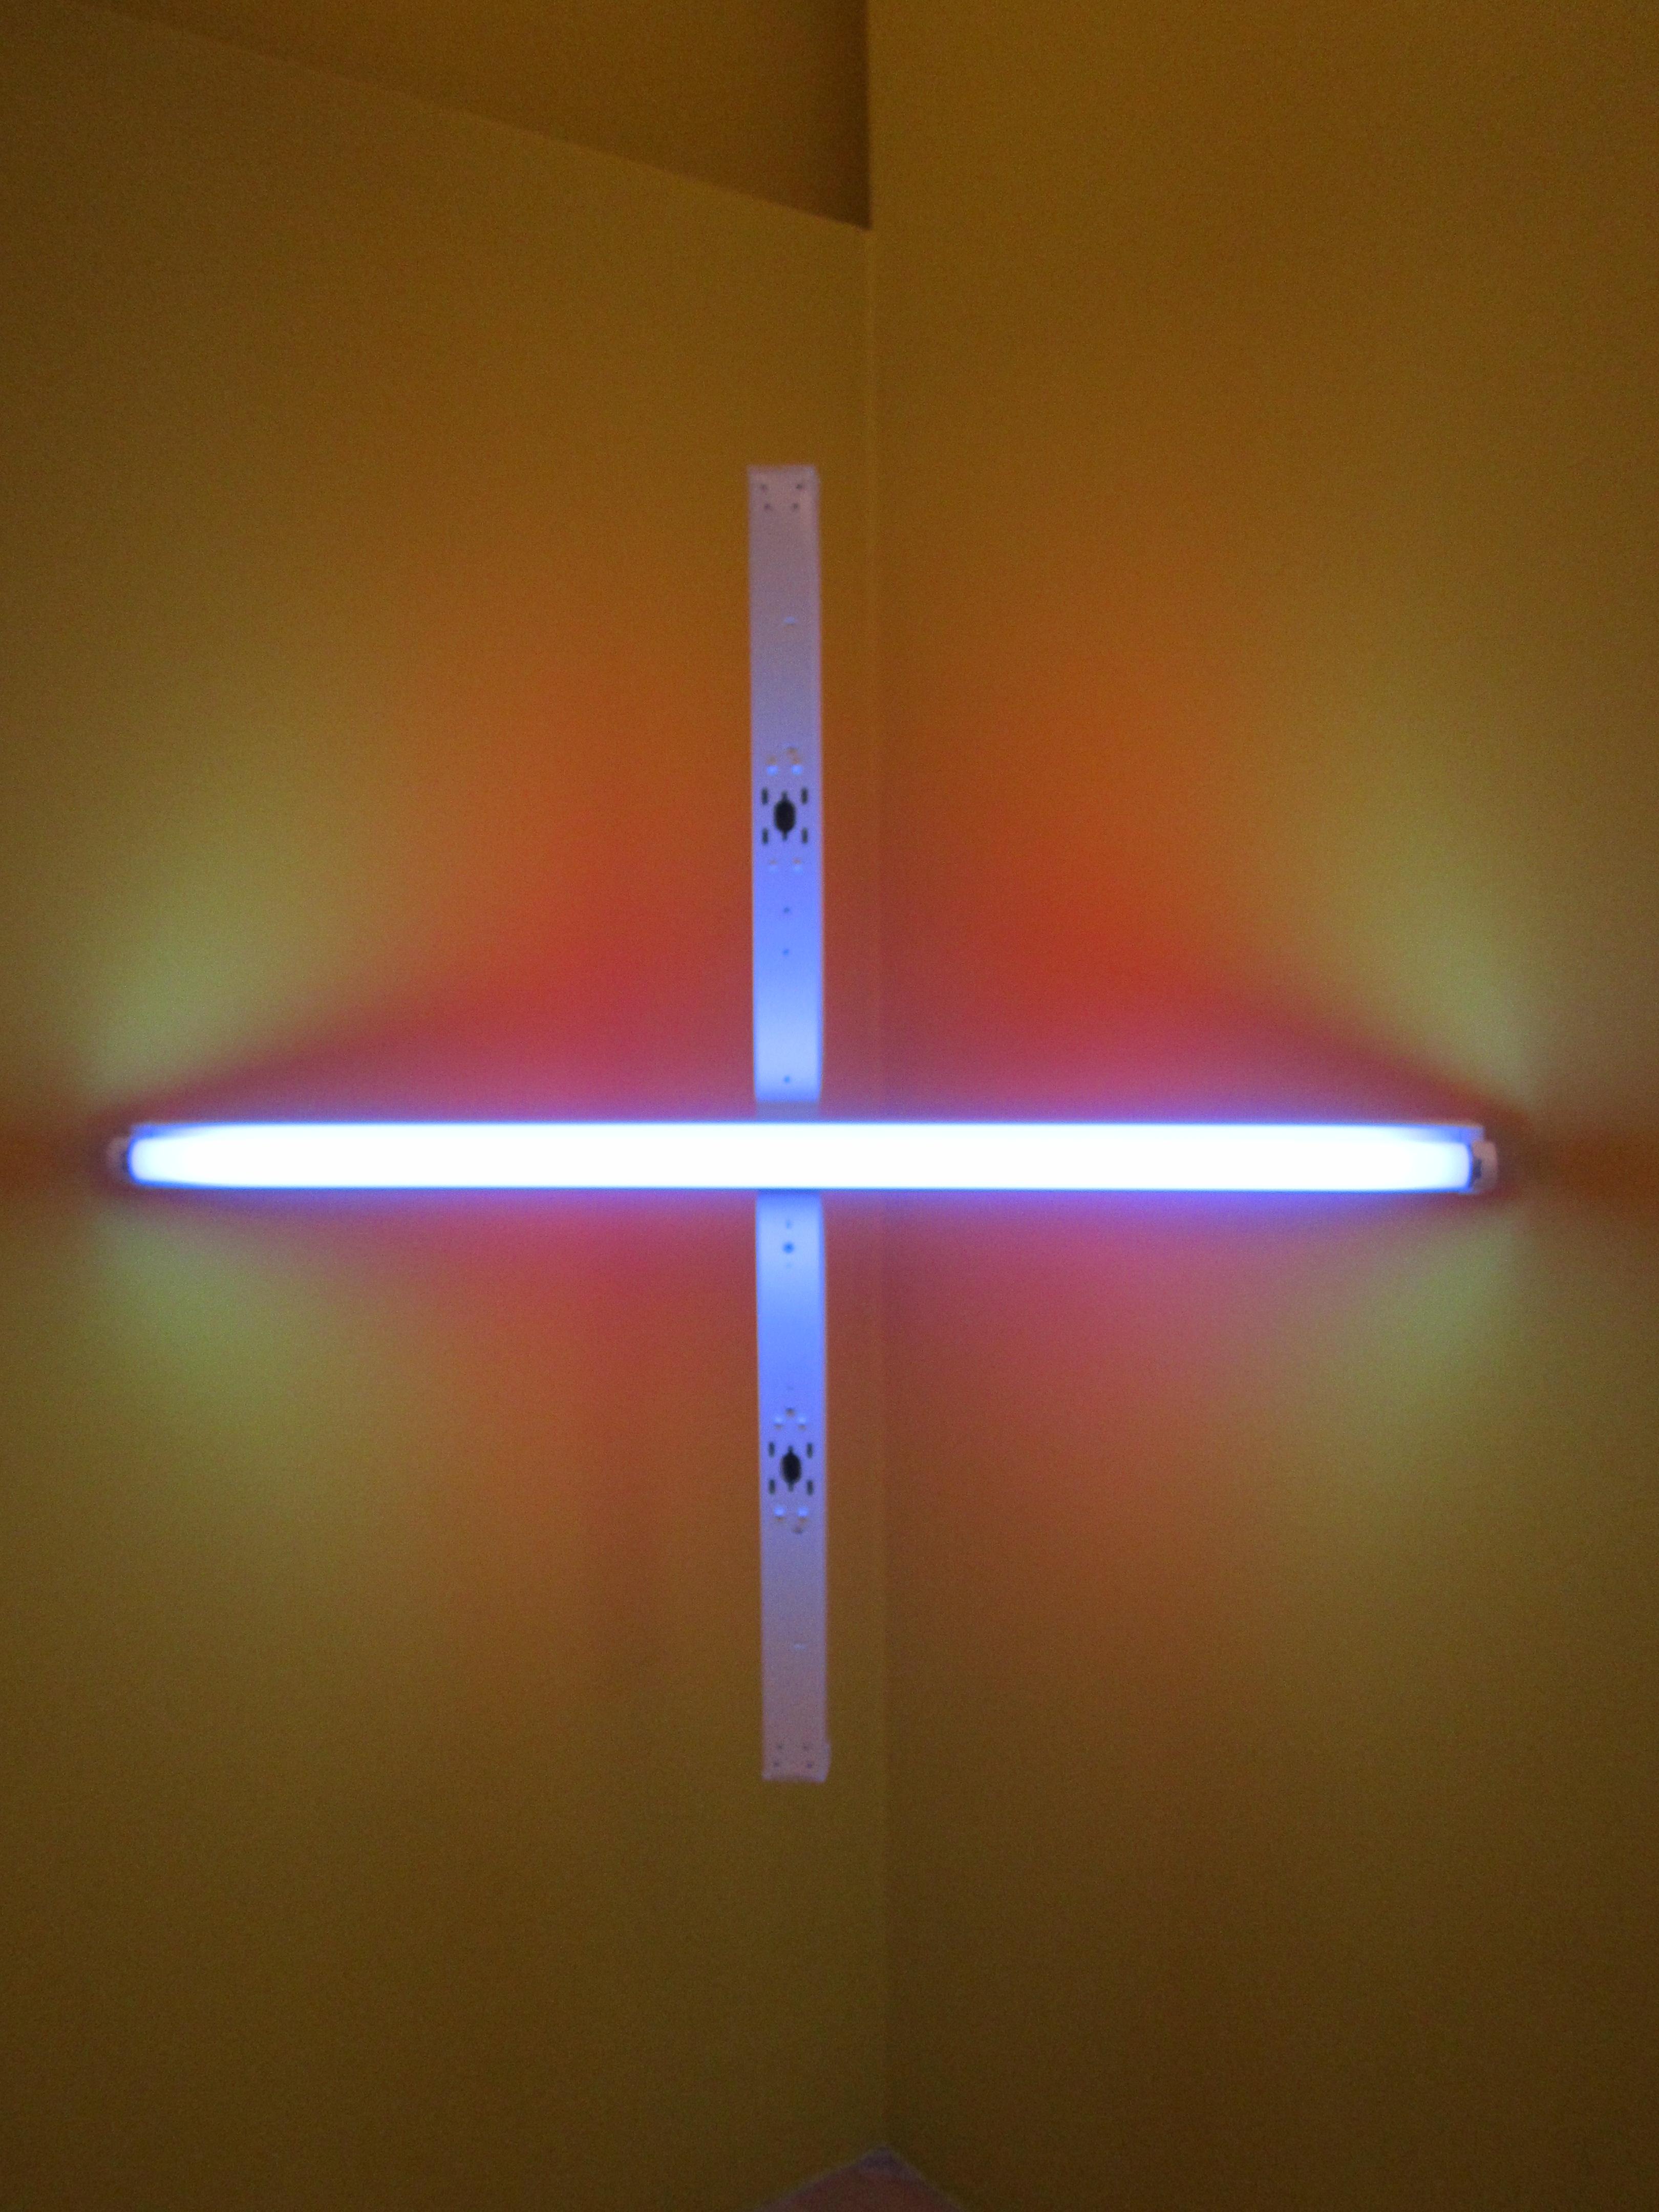 Dan Flavin Unititled (Corner Piece) by Dan Flavin, Tate Liverpool